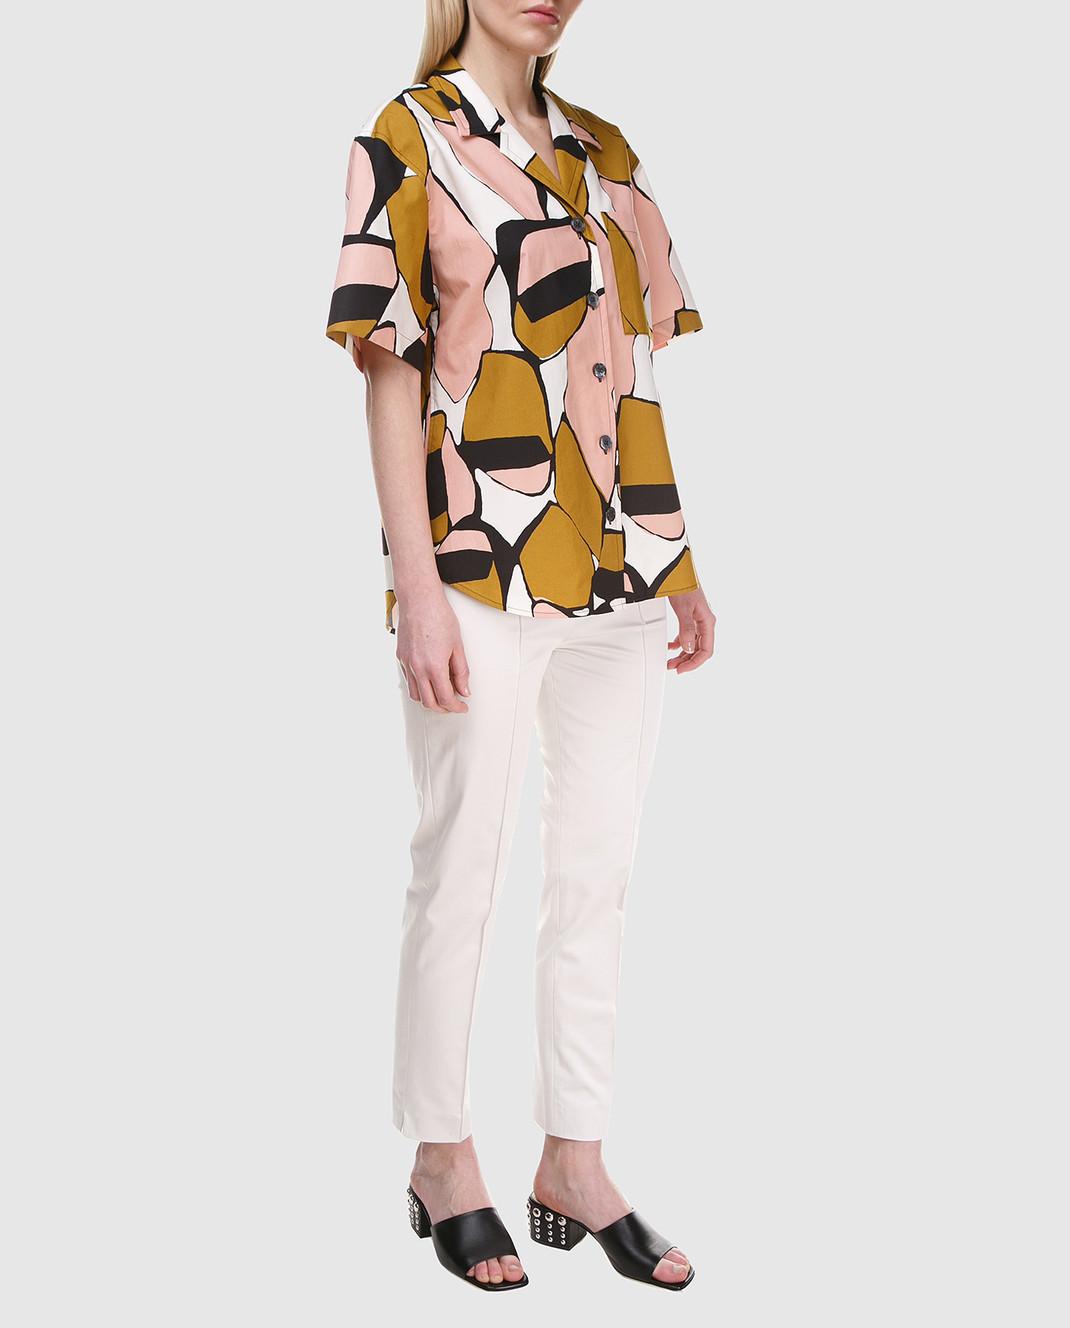 Marc Jacobs Белые брюки M4007166 изображение 2